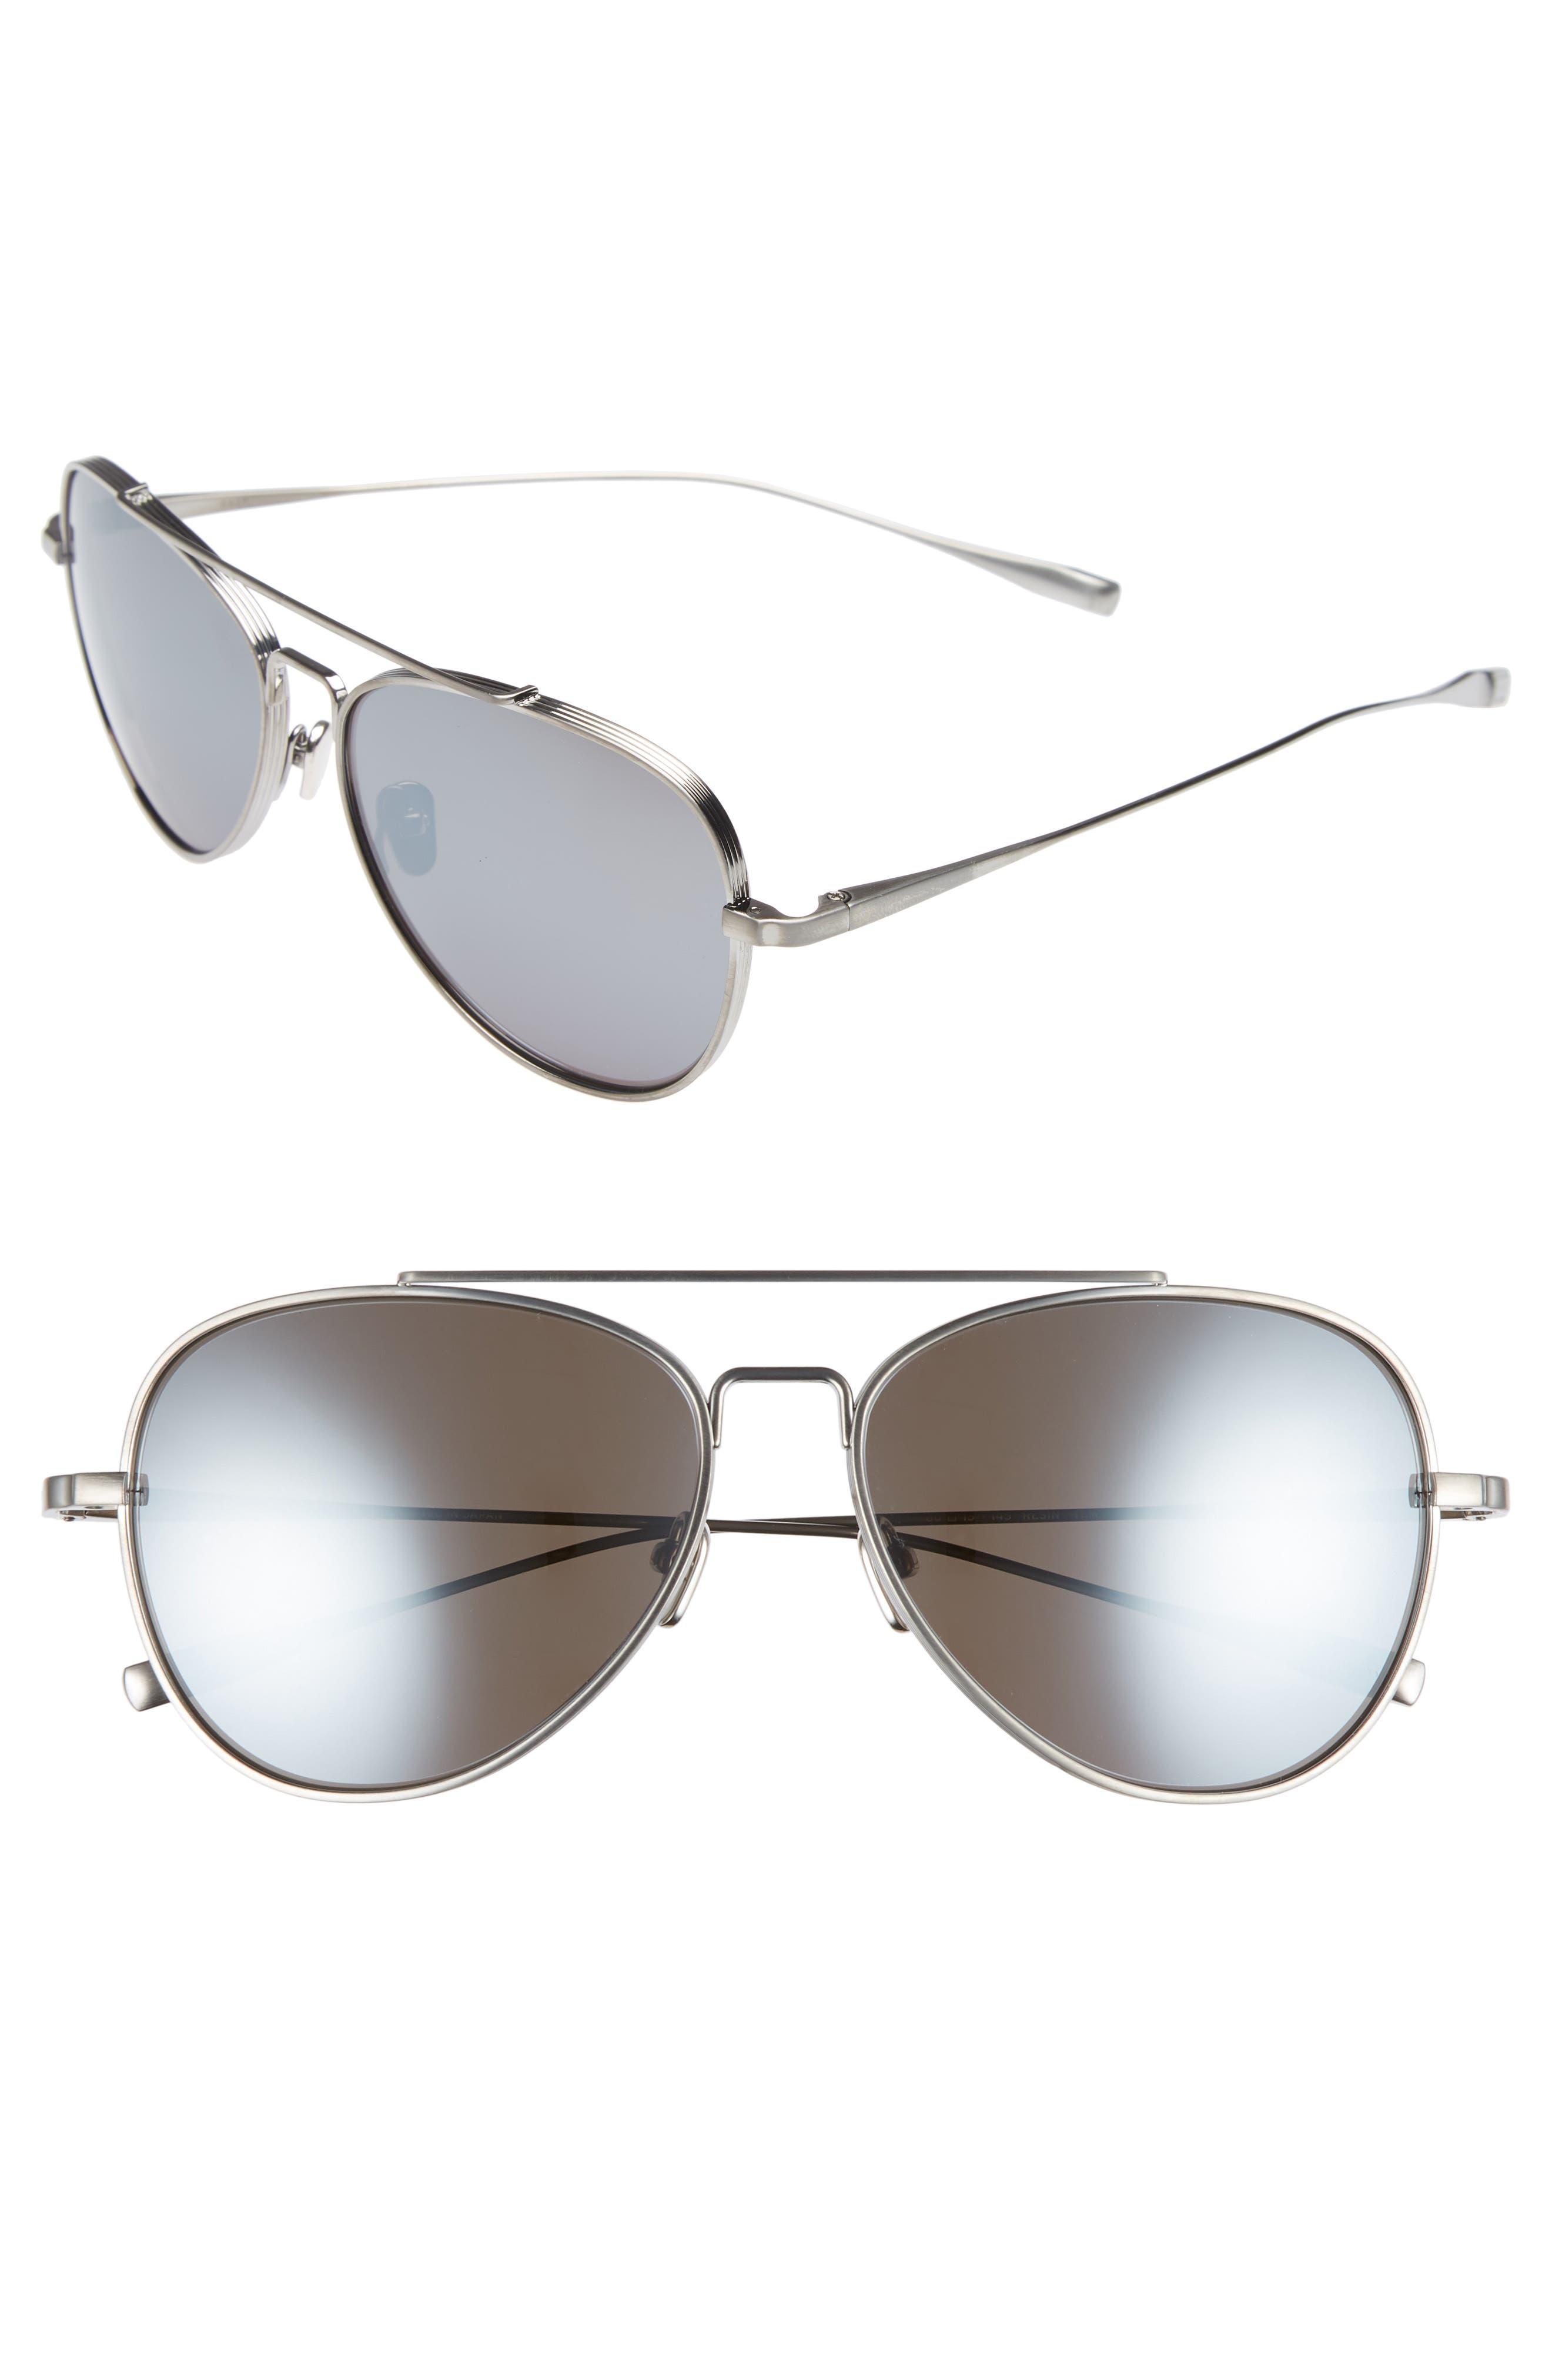 60mm Polarized Aviator Sunglasses,                         Main,                         color, Tempest